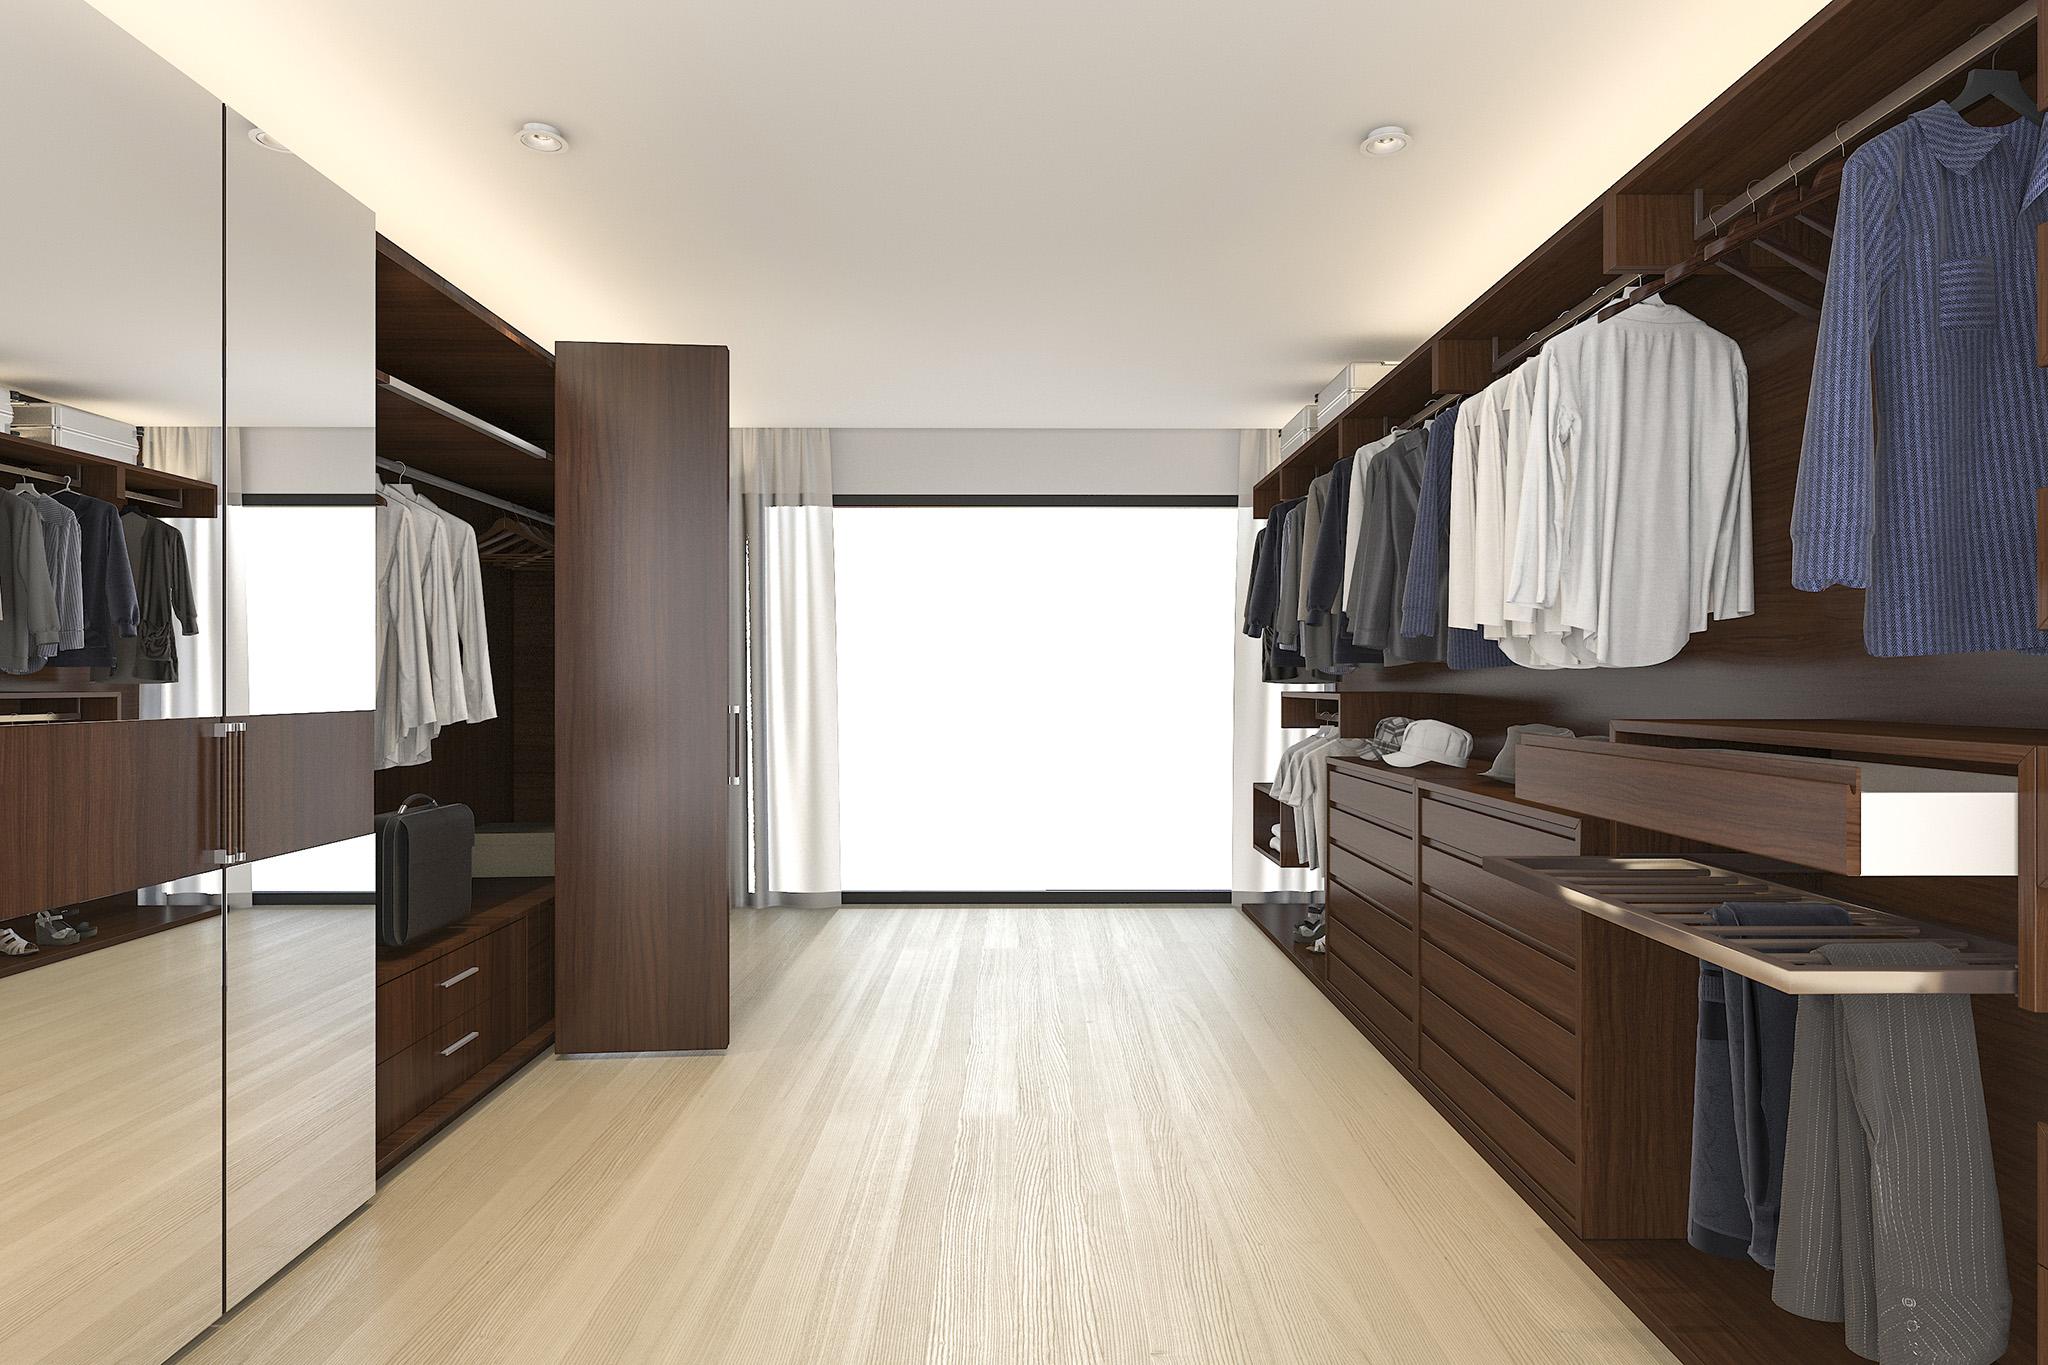 open wardrobe system, mirror wardrobe doors, bespoke storage solutions